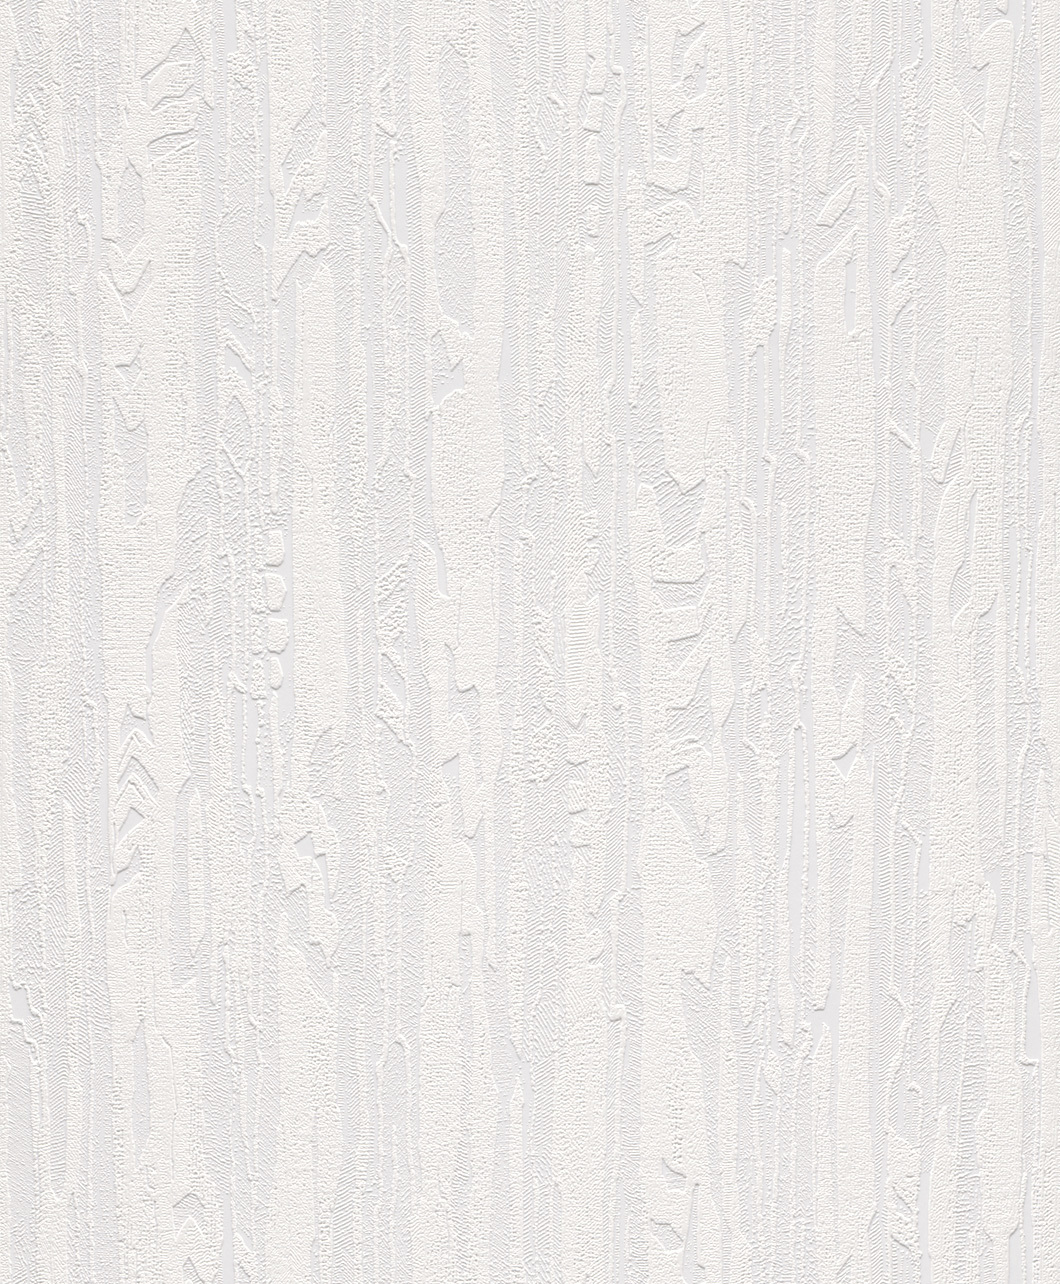 vliestapete berstreichbar struktur grob rasch 103908. Black Bedroom Furniture Sets. Home Design Ideas